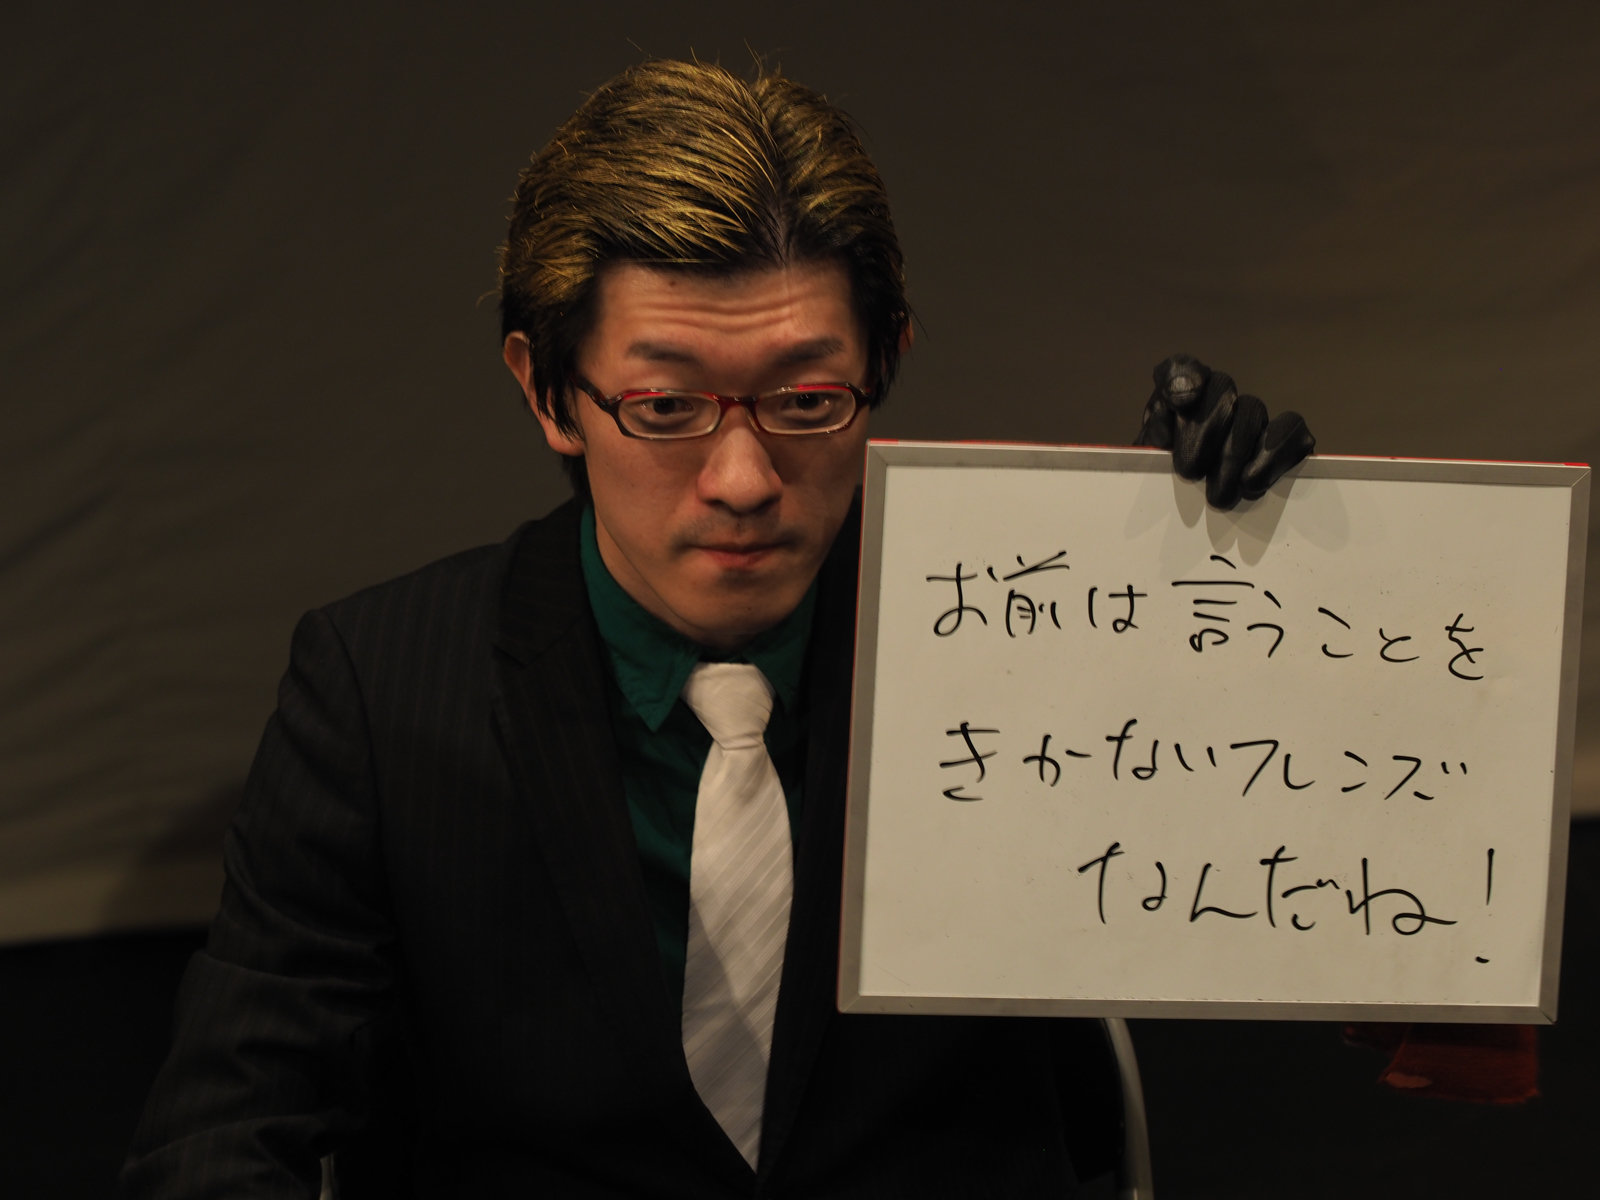 f:id:motomachi24:20170507192203j:plain